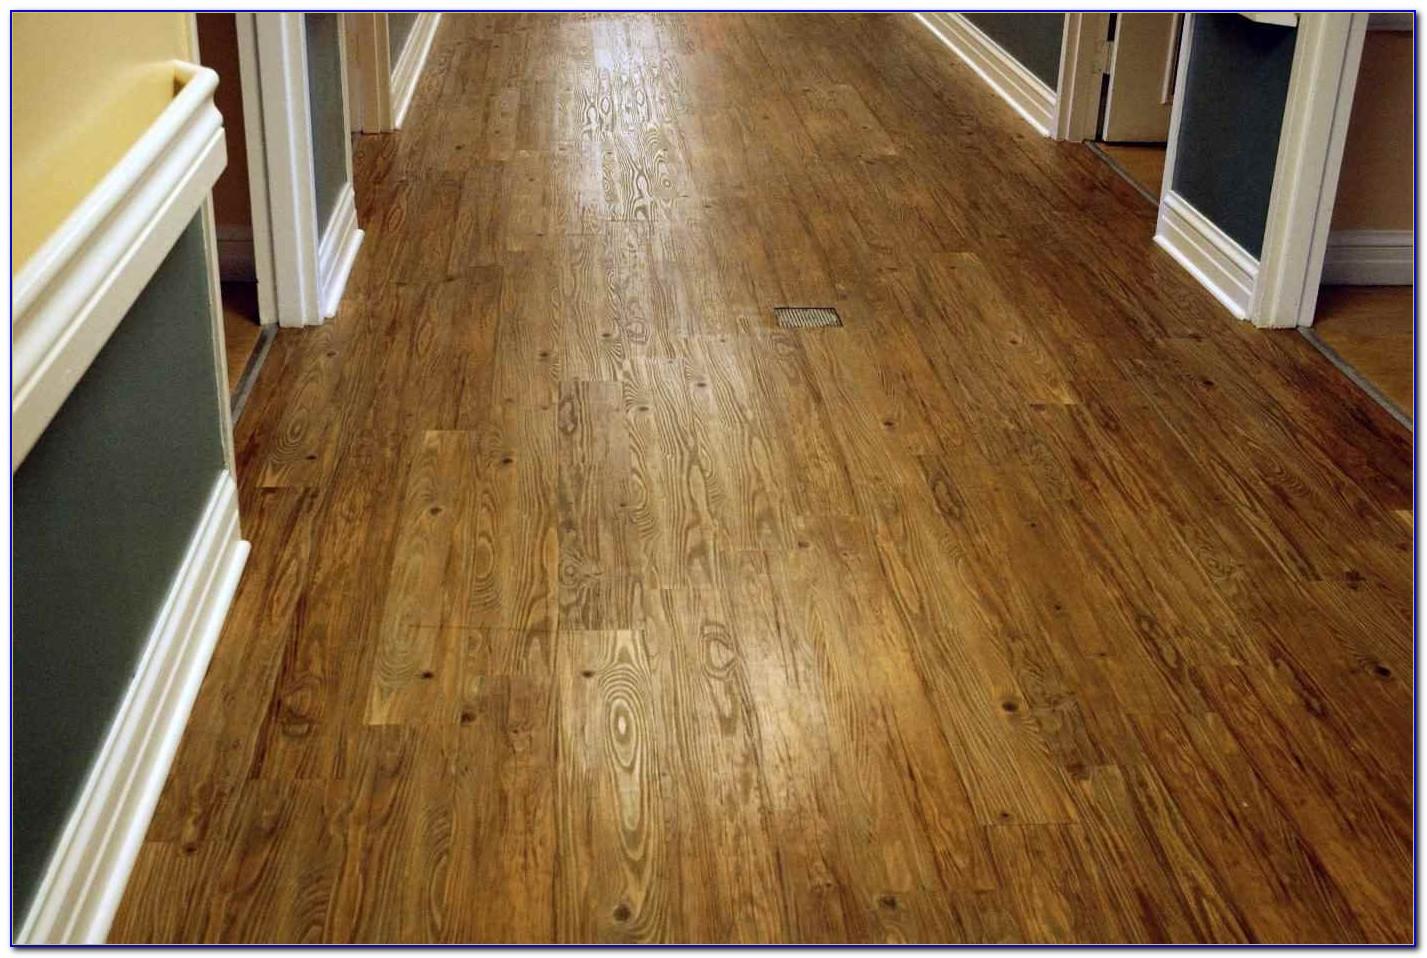 High quality laminate flooring vs hardwood flooring for High quality laminate flooring